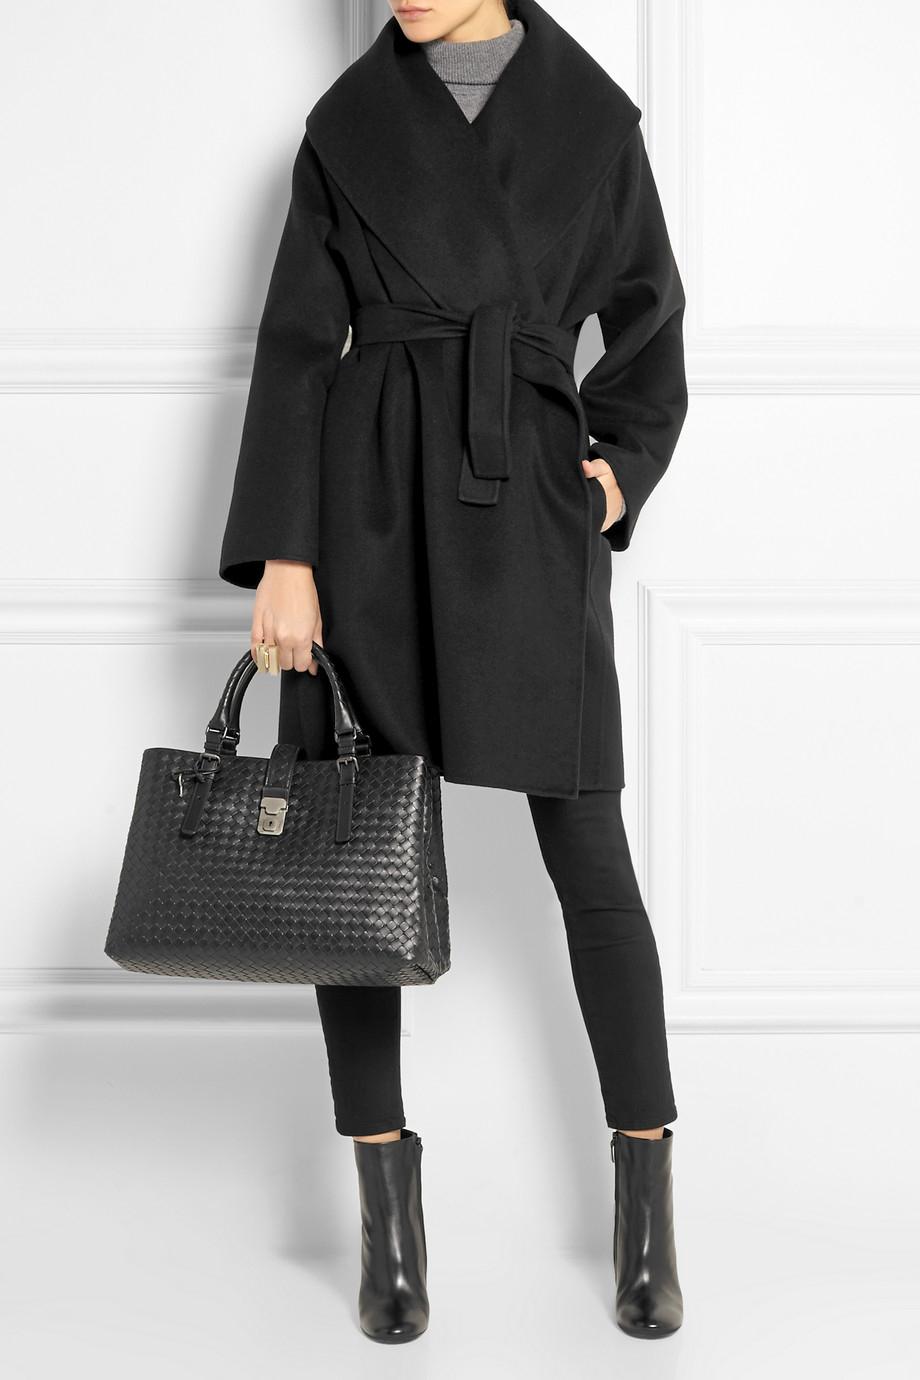 Bottega veneta Belted Double-Faced Cashmere Coat in Black   Lyst